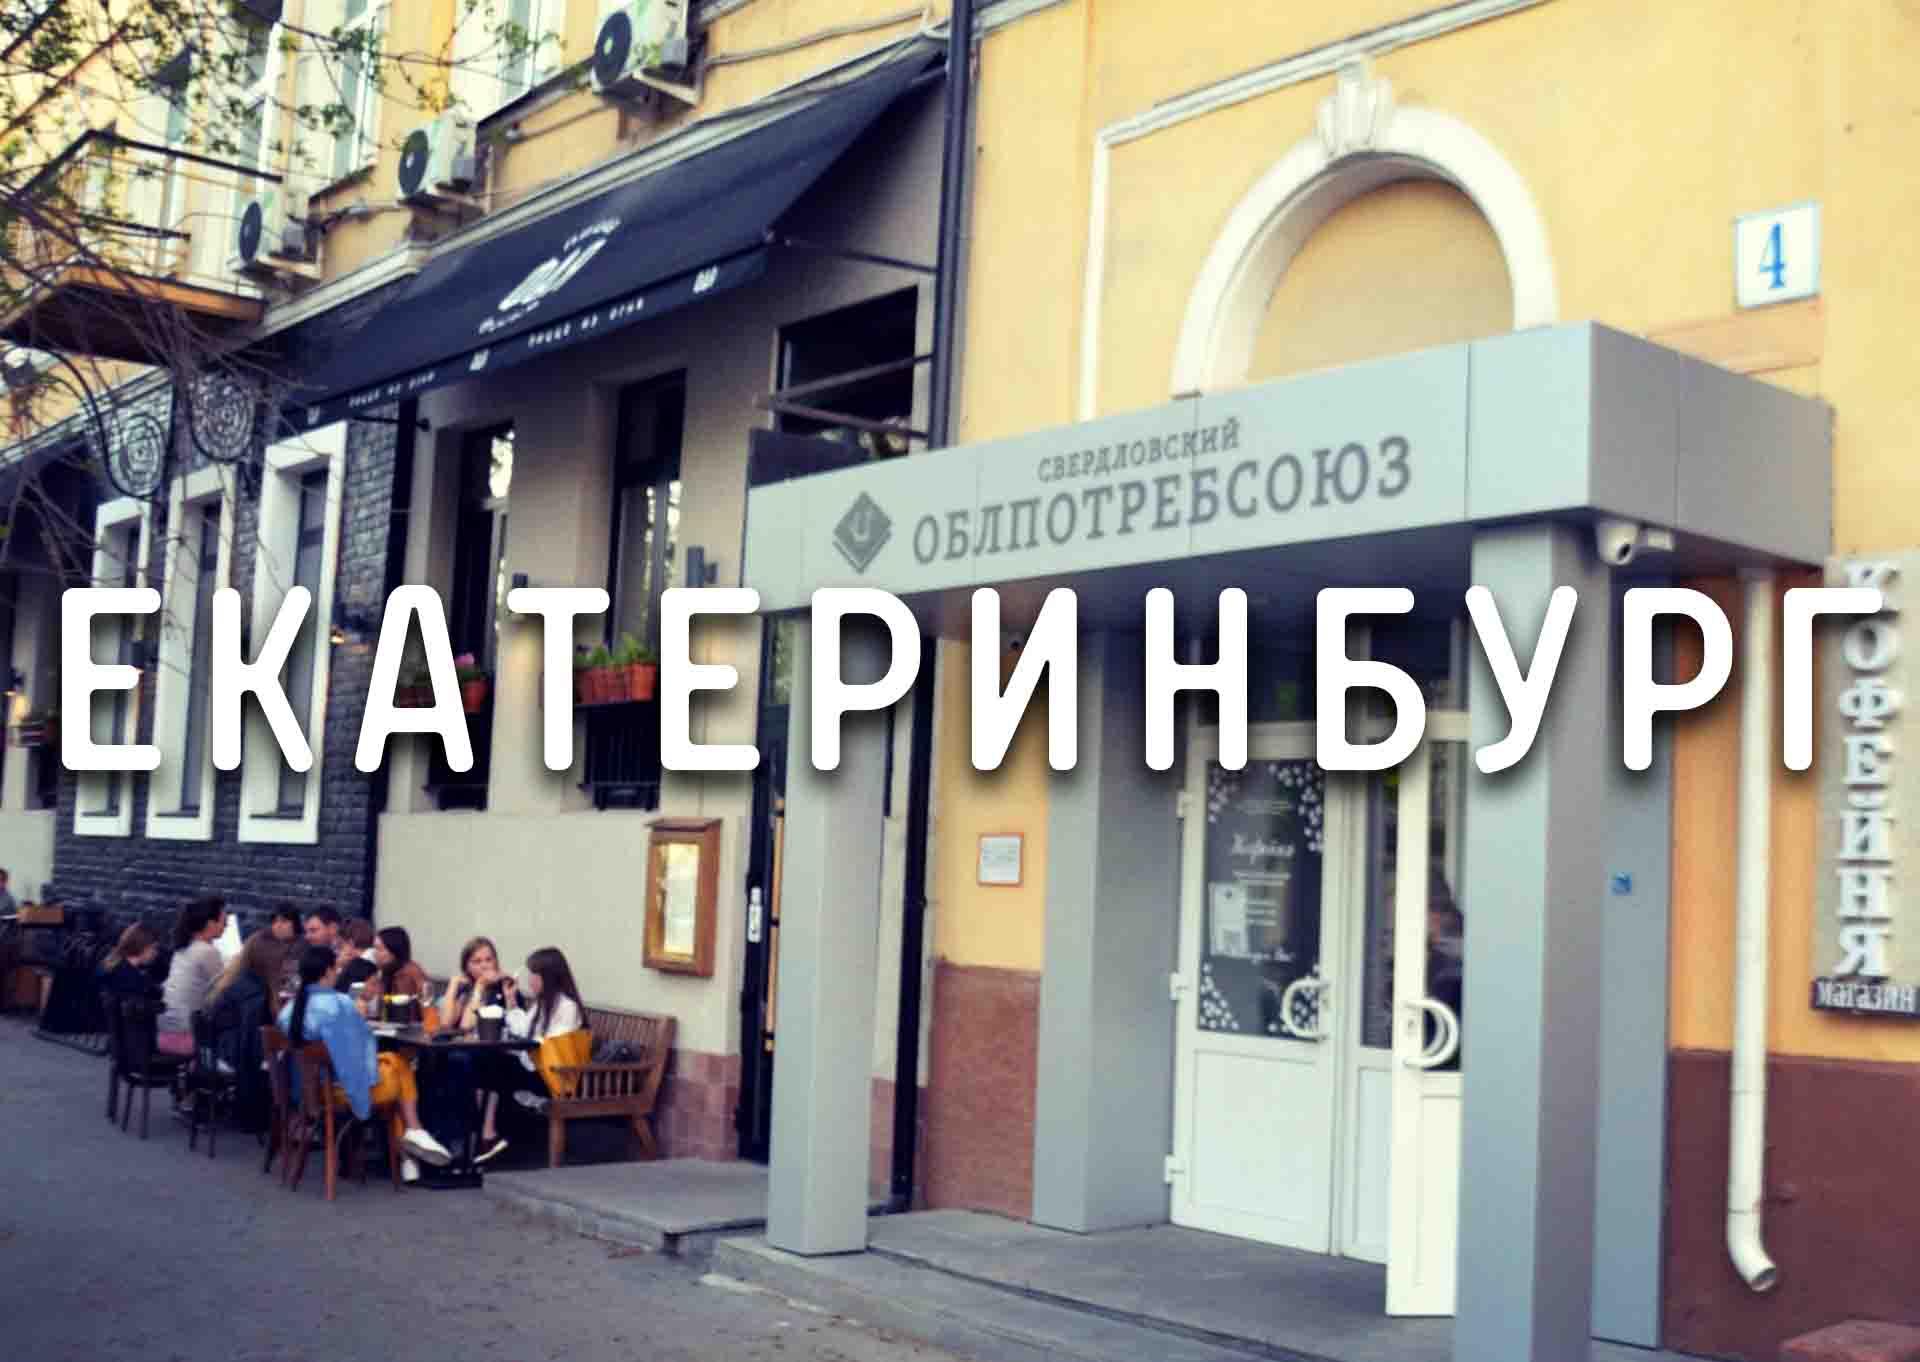 Екатеринбург 8 марта 4